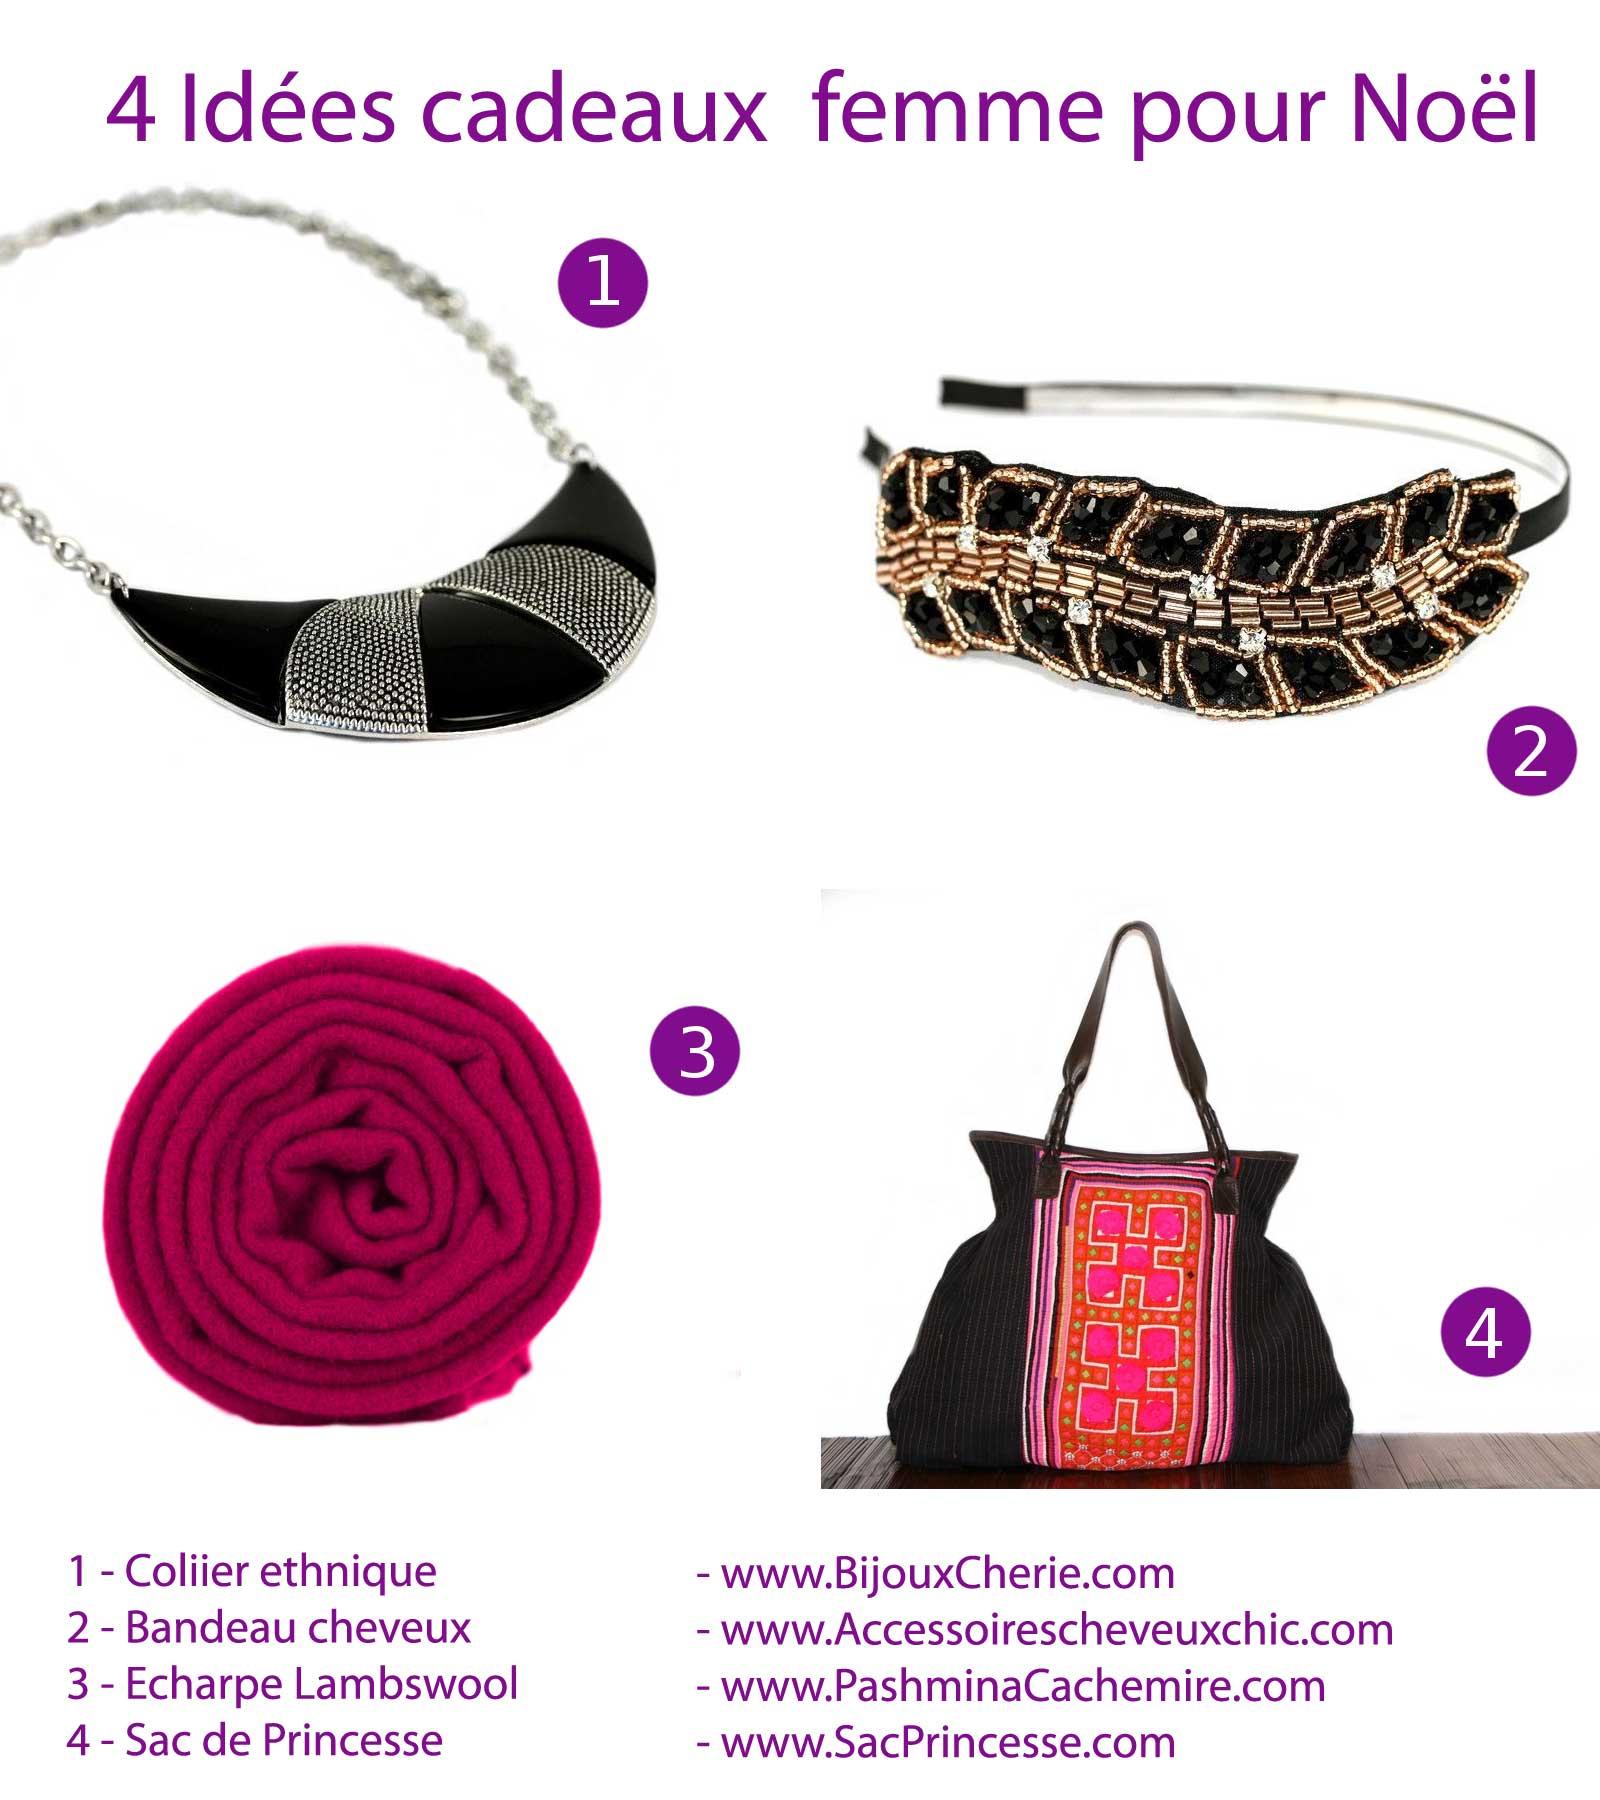 idee-cadeau-femme-noel